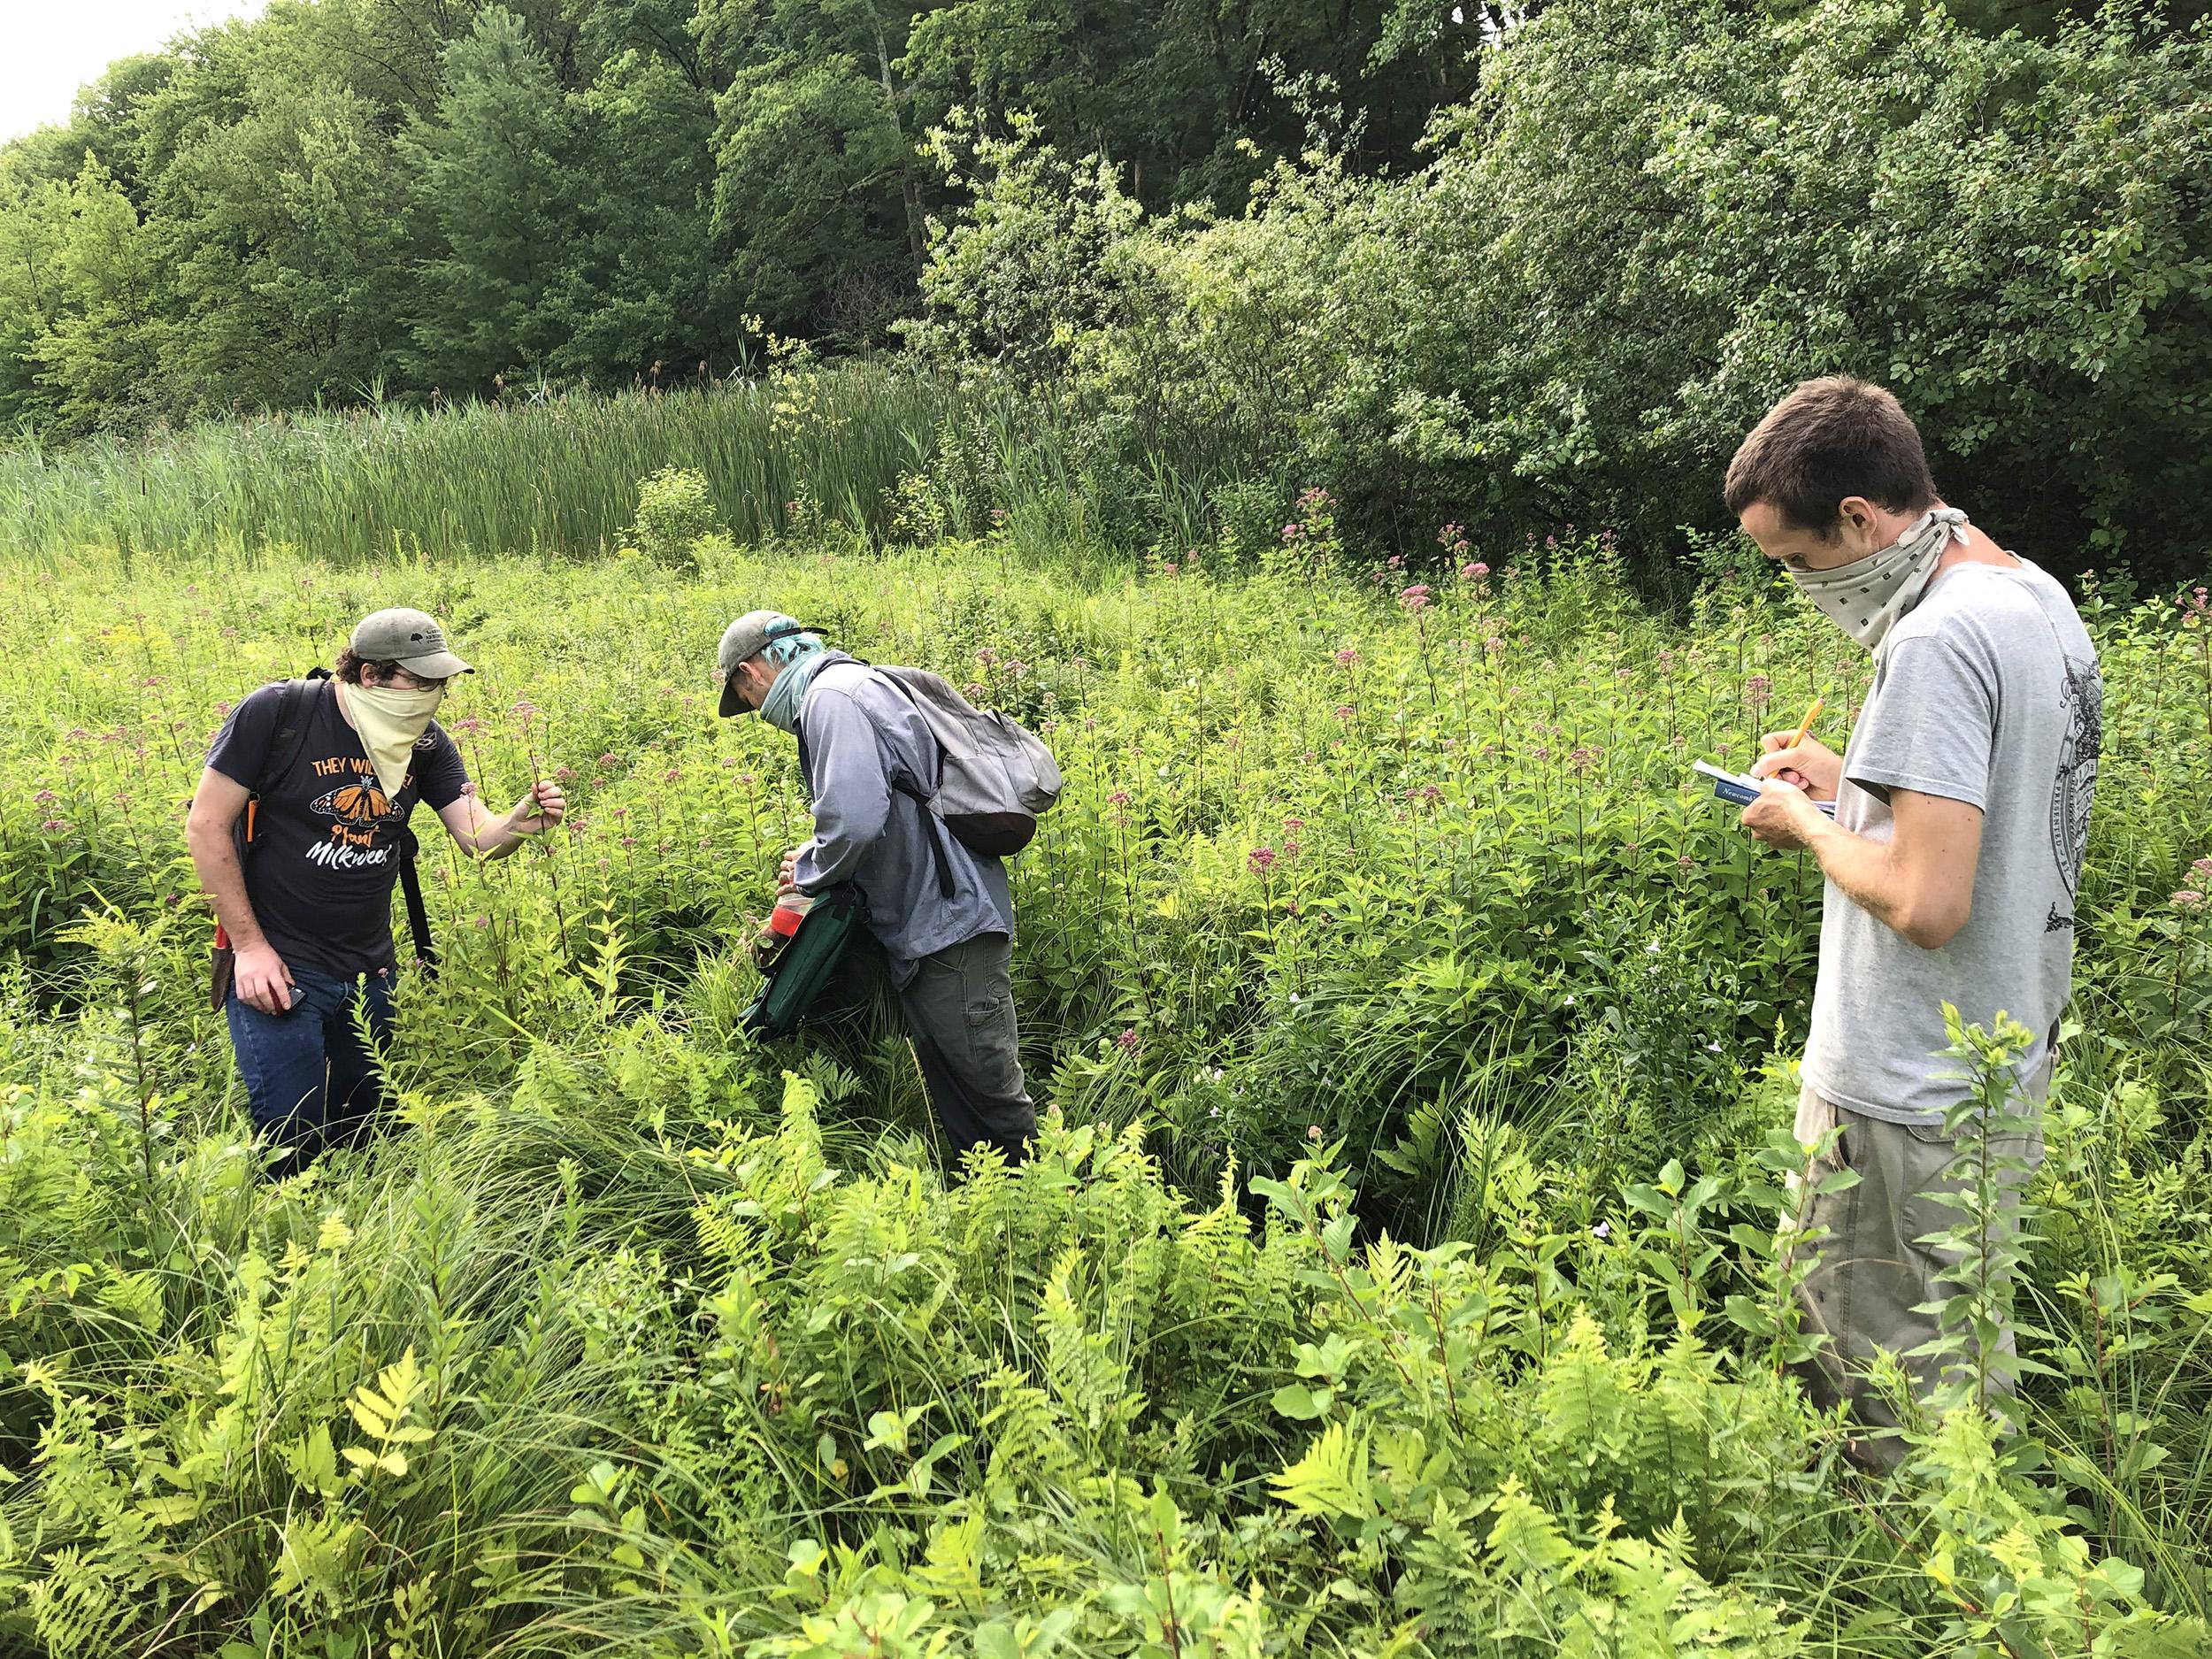 Colin McCallum-Cook, Scott Phillips, and Brendan Keegan collecting plants at Moose Hill Wildlife Sanctuary